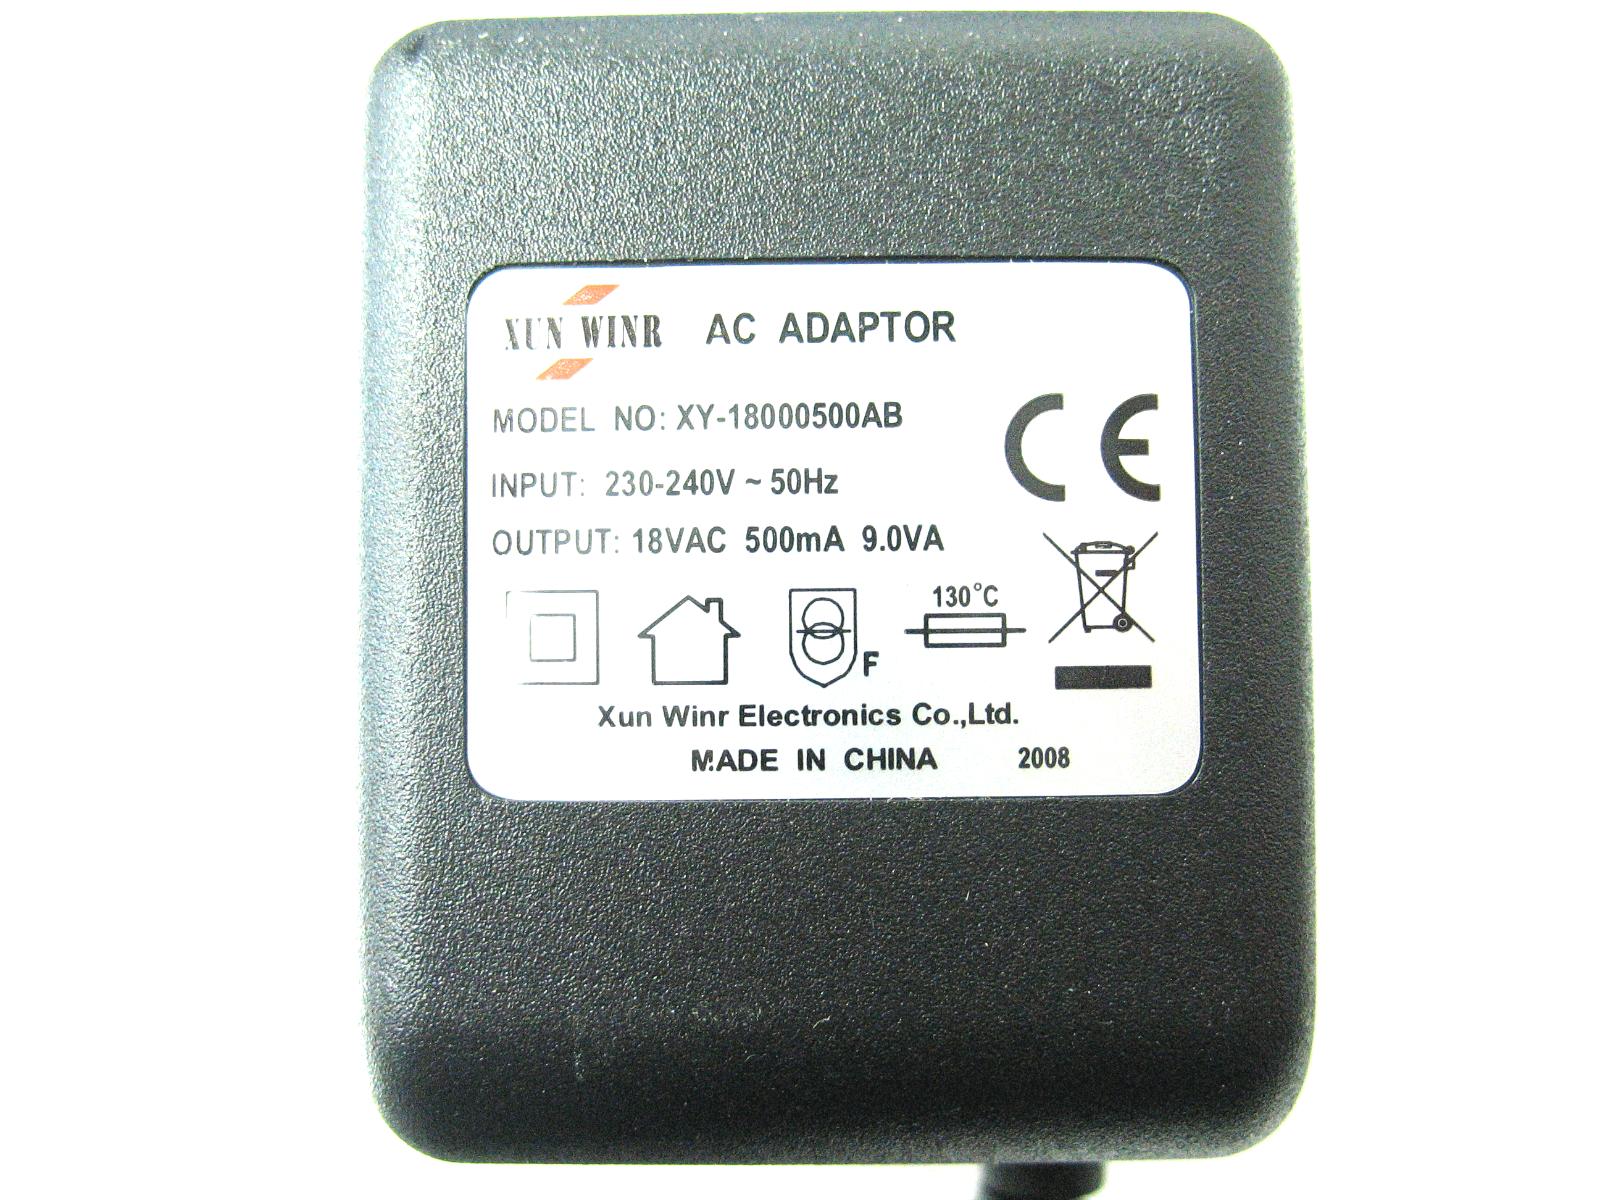 0.5 amp 18 volt AC-AC (AC Output) Mains Power Adaptor/Supply/Charger (9 watt)